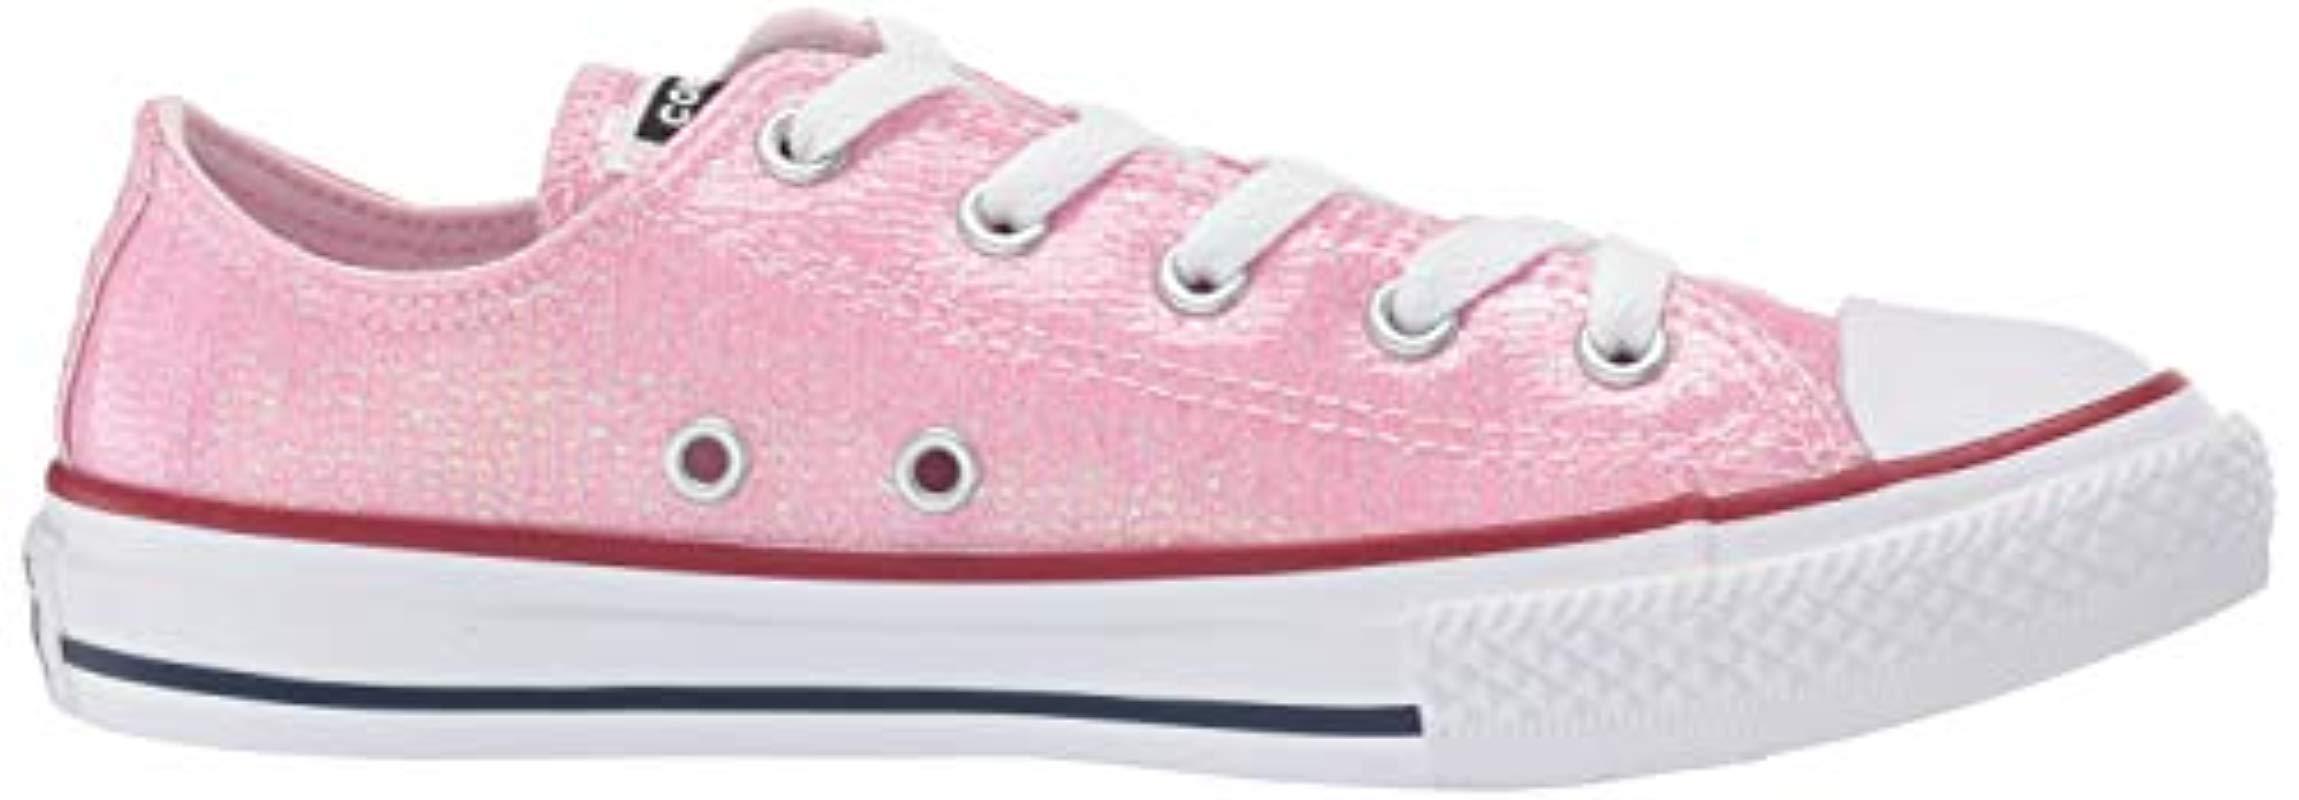 Chuck Taylor All Star, Zapatillas de Lona Infantil Converse de hombre de color Rosa